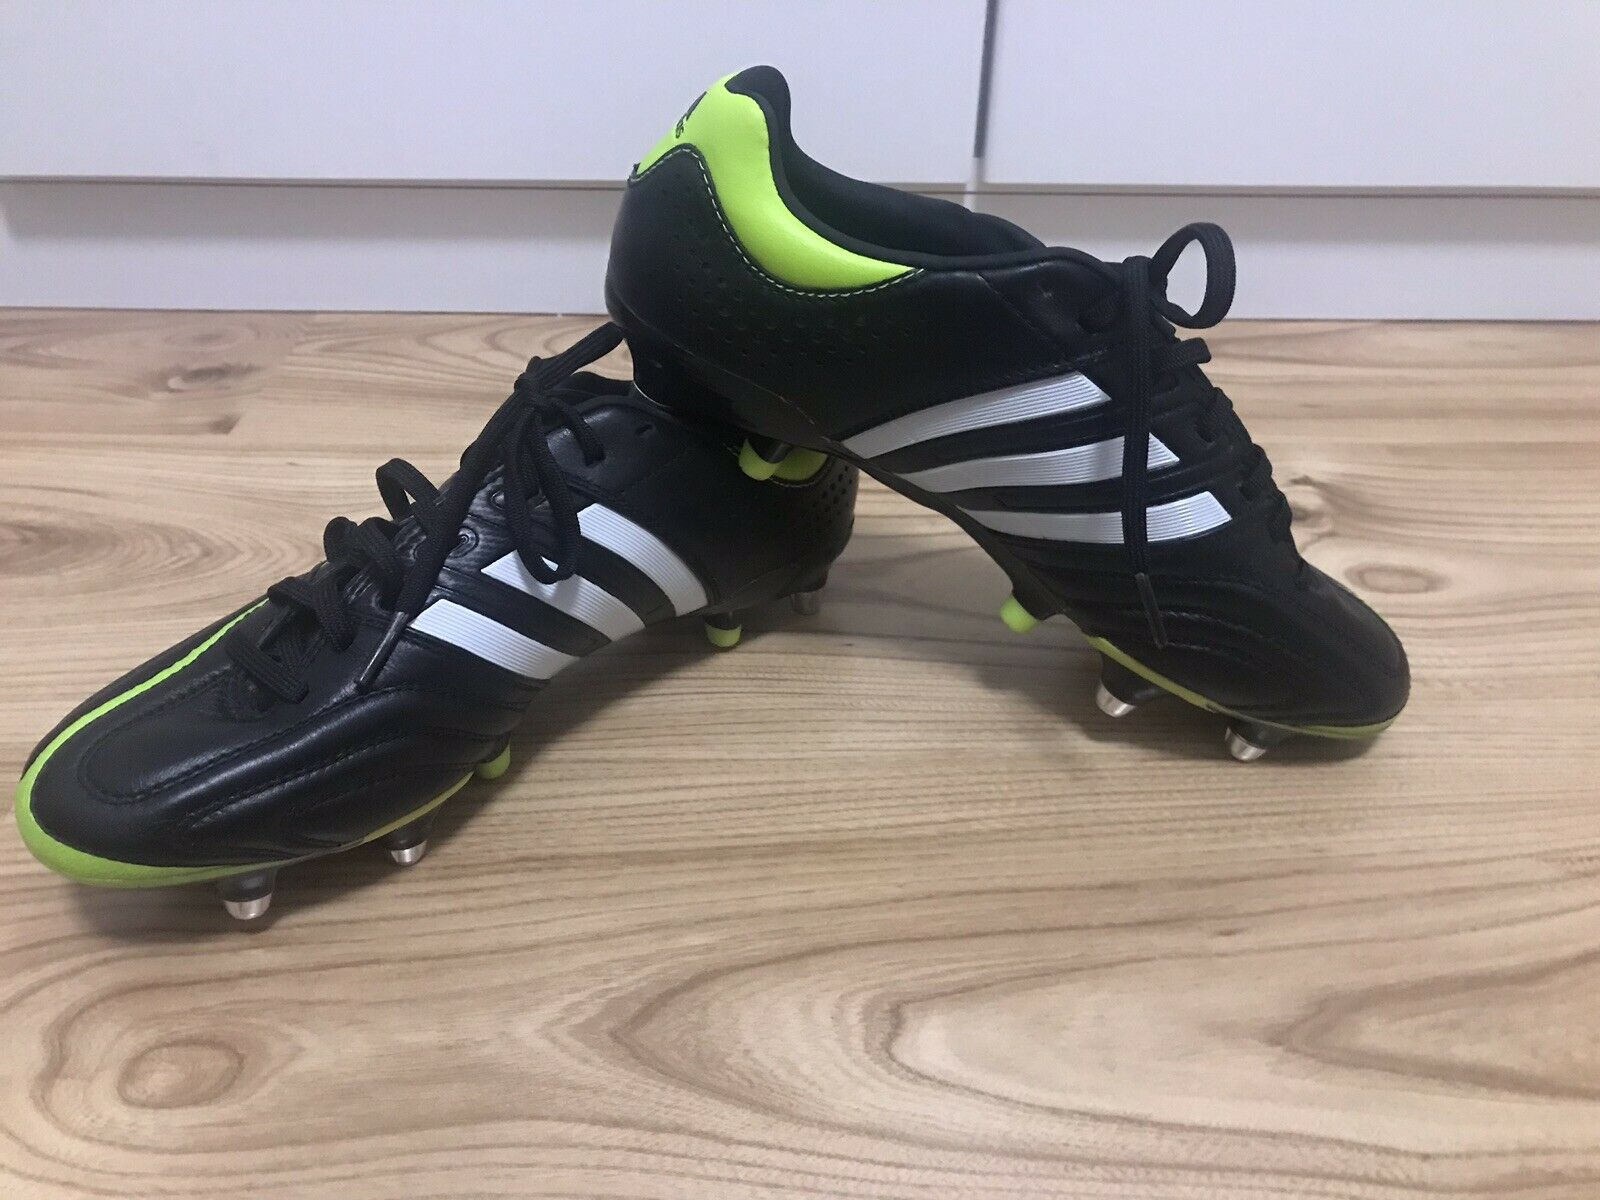 Adidas Adipure 11pro 39 1 3 NEU LEDER Schwarz-Grün Eisenstollen Männerschuh